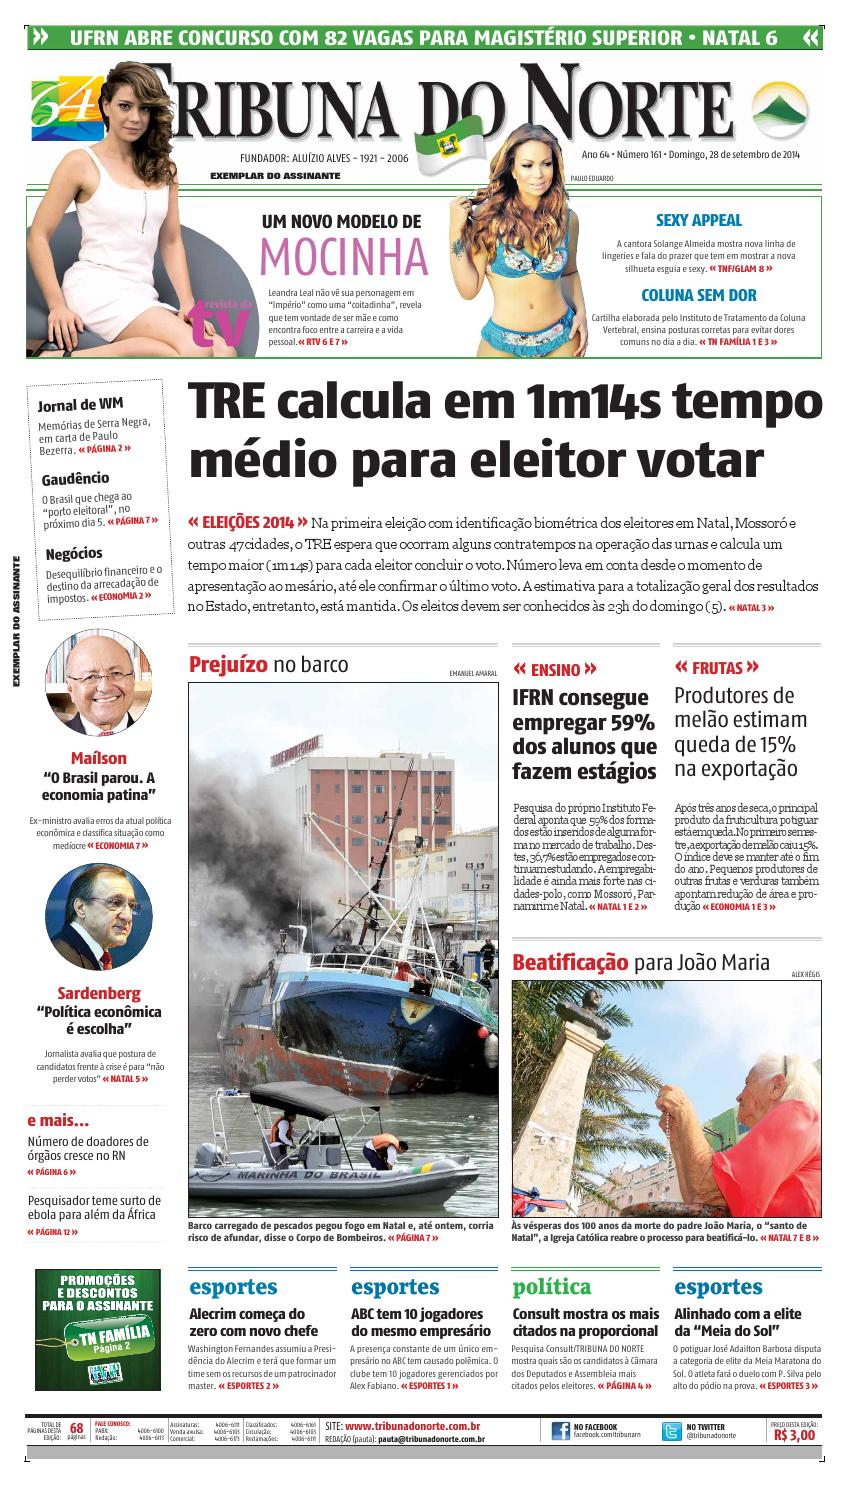 c85dcc3b278a1 Tribuna do Norte - 28 09 2014 by Empresa Jornalística Tribuna do Norte Ltda  - issuu